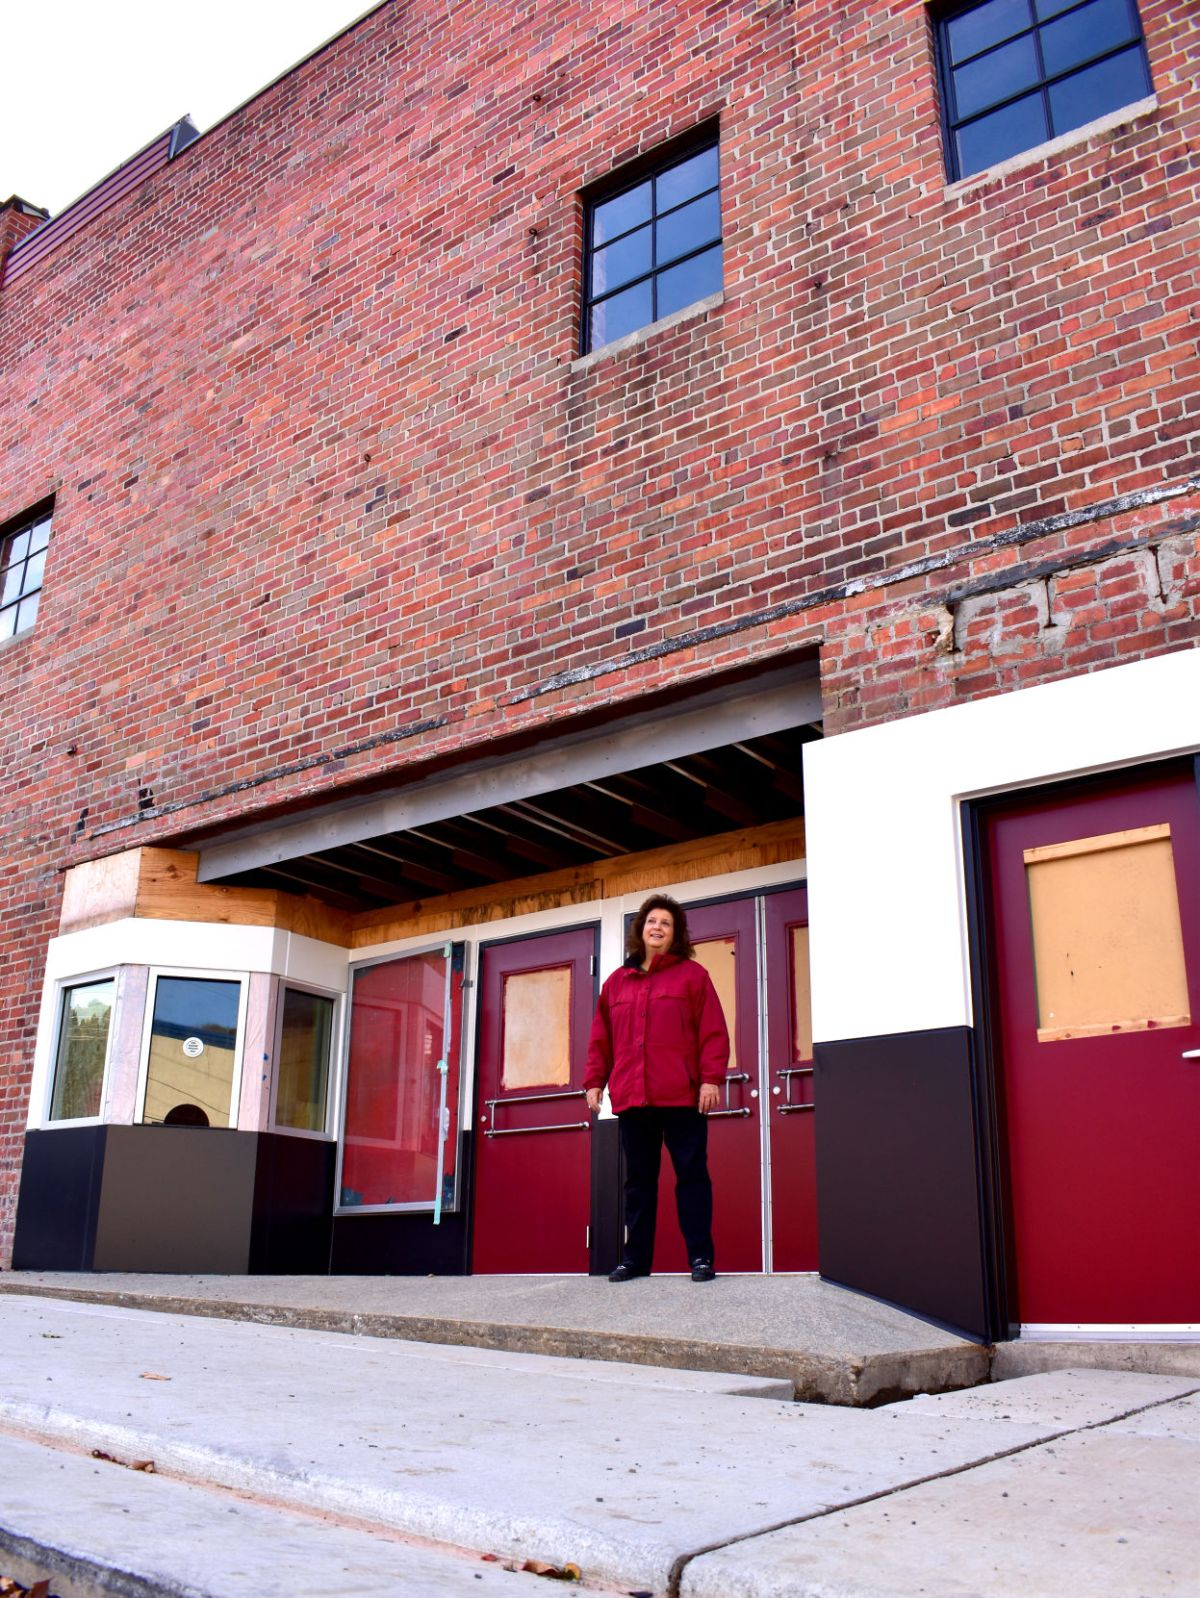 Lyric Brick House : lyric, brick, house, Lyric, Downtown, Composition, Local, Timesnews.net